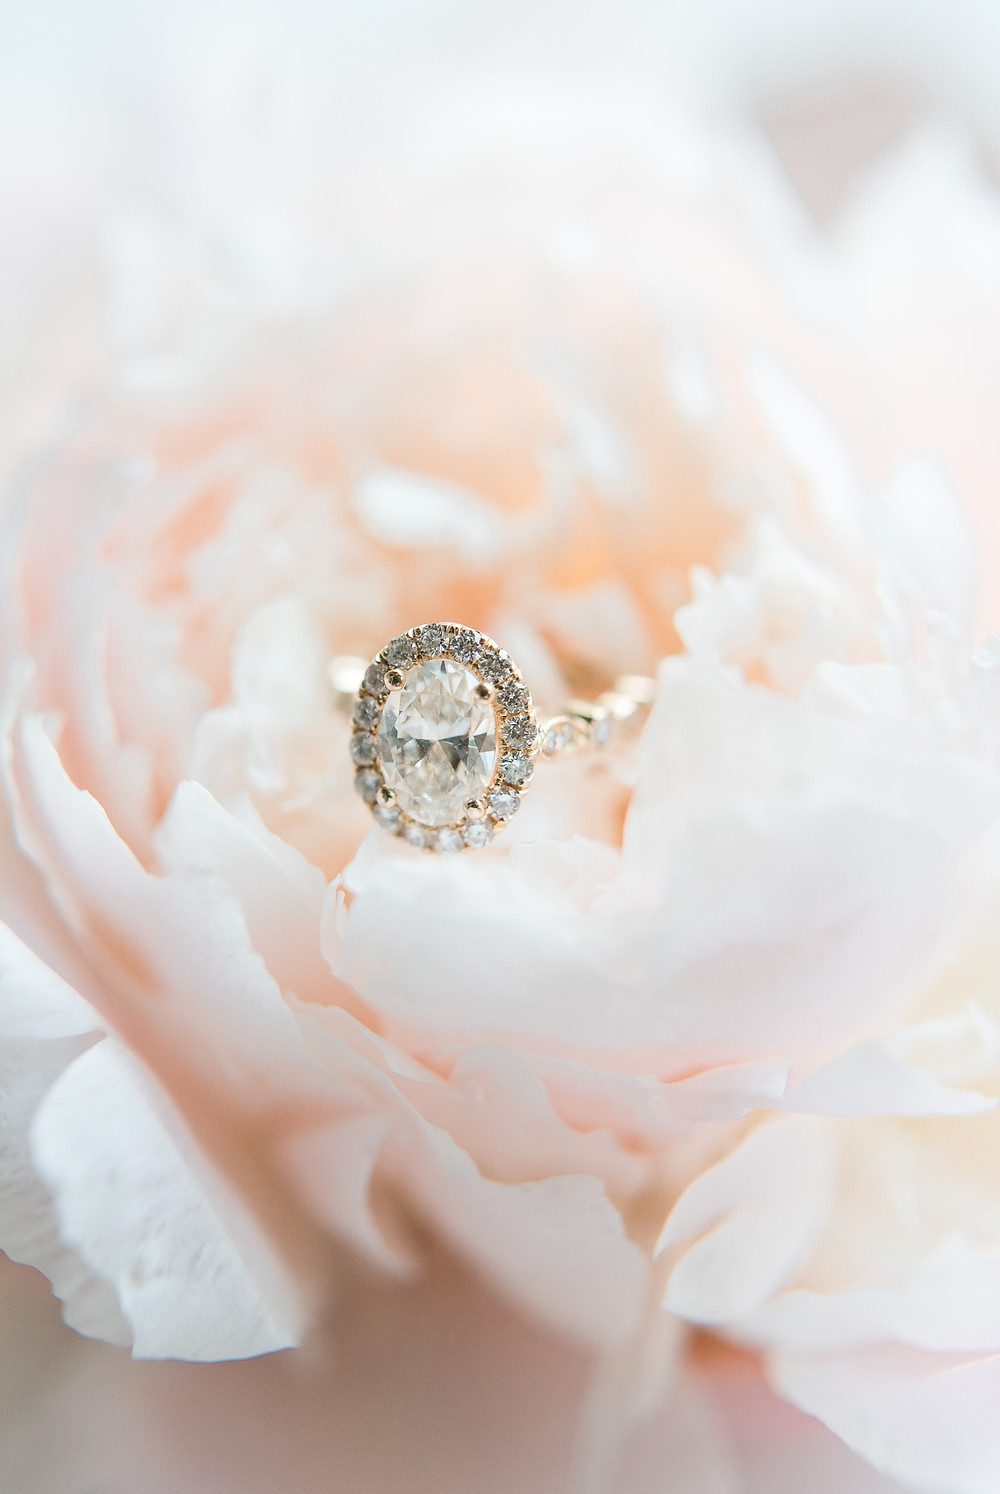 blue-mountain-vineyard-wedding-venue-outdoor-wedding-ceremony-rosegold-ring-the-mrs-box